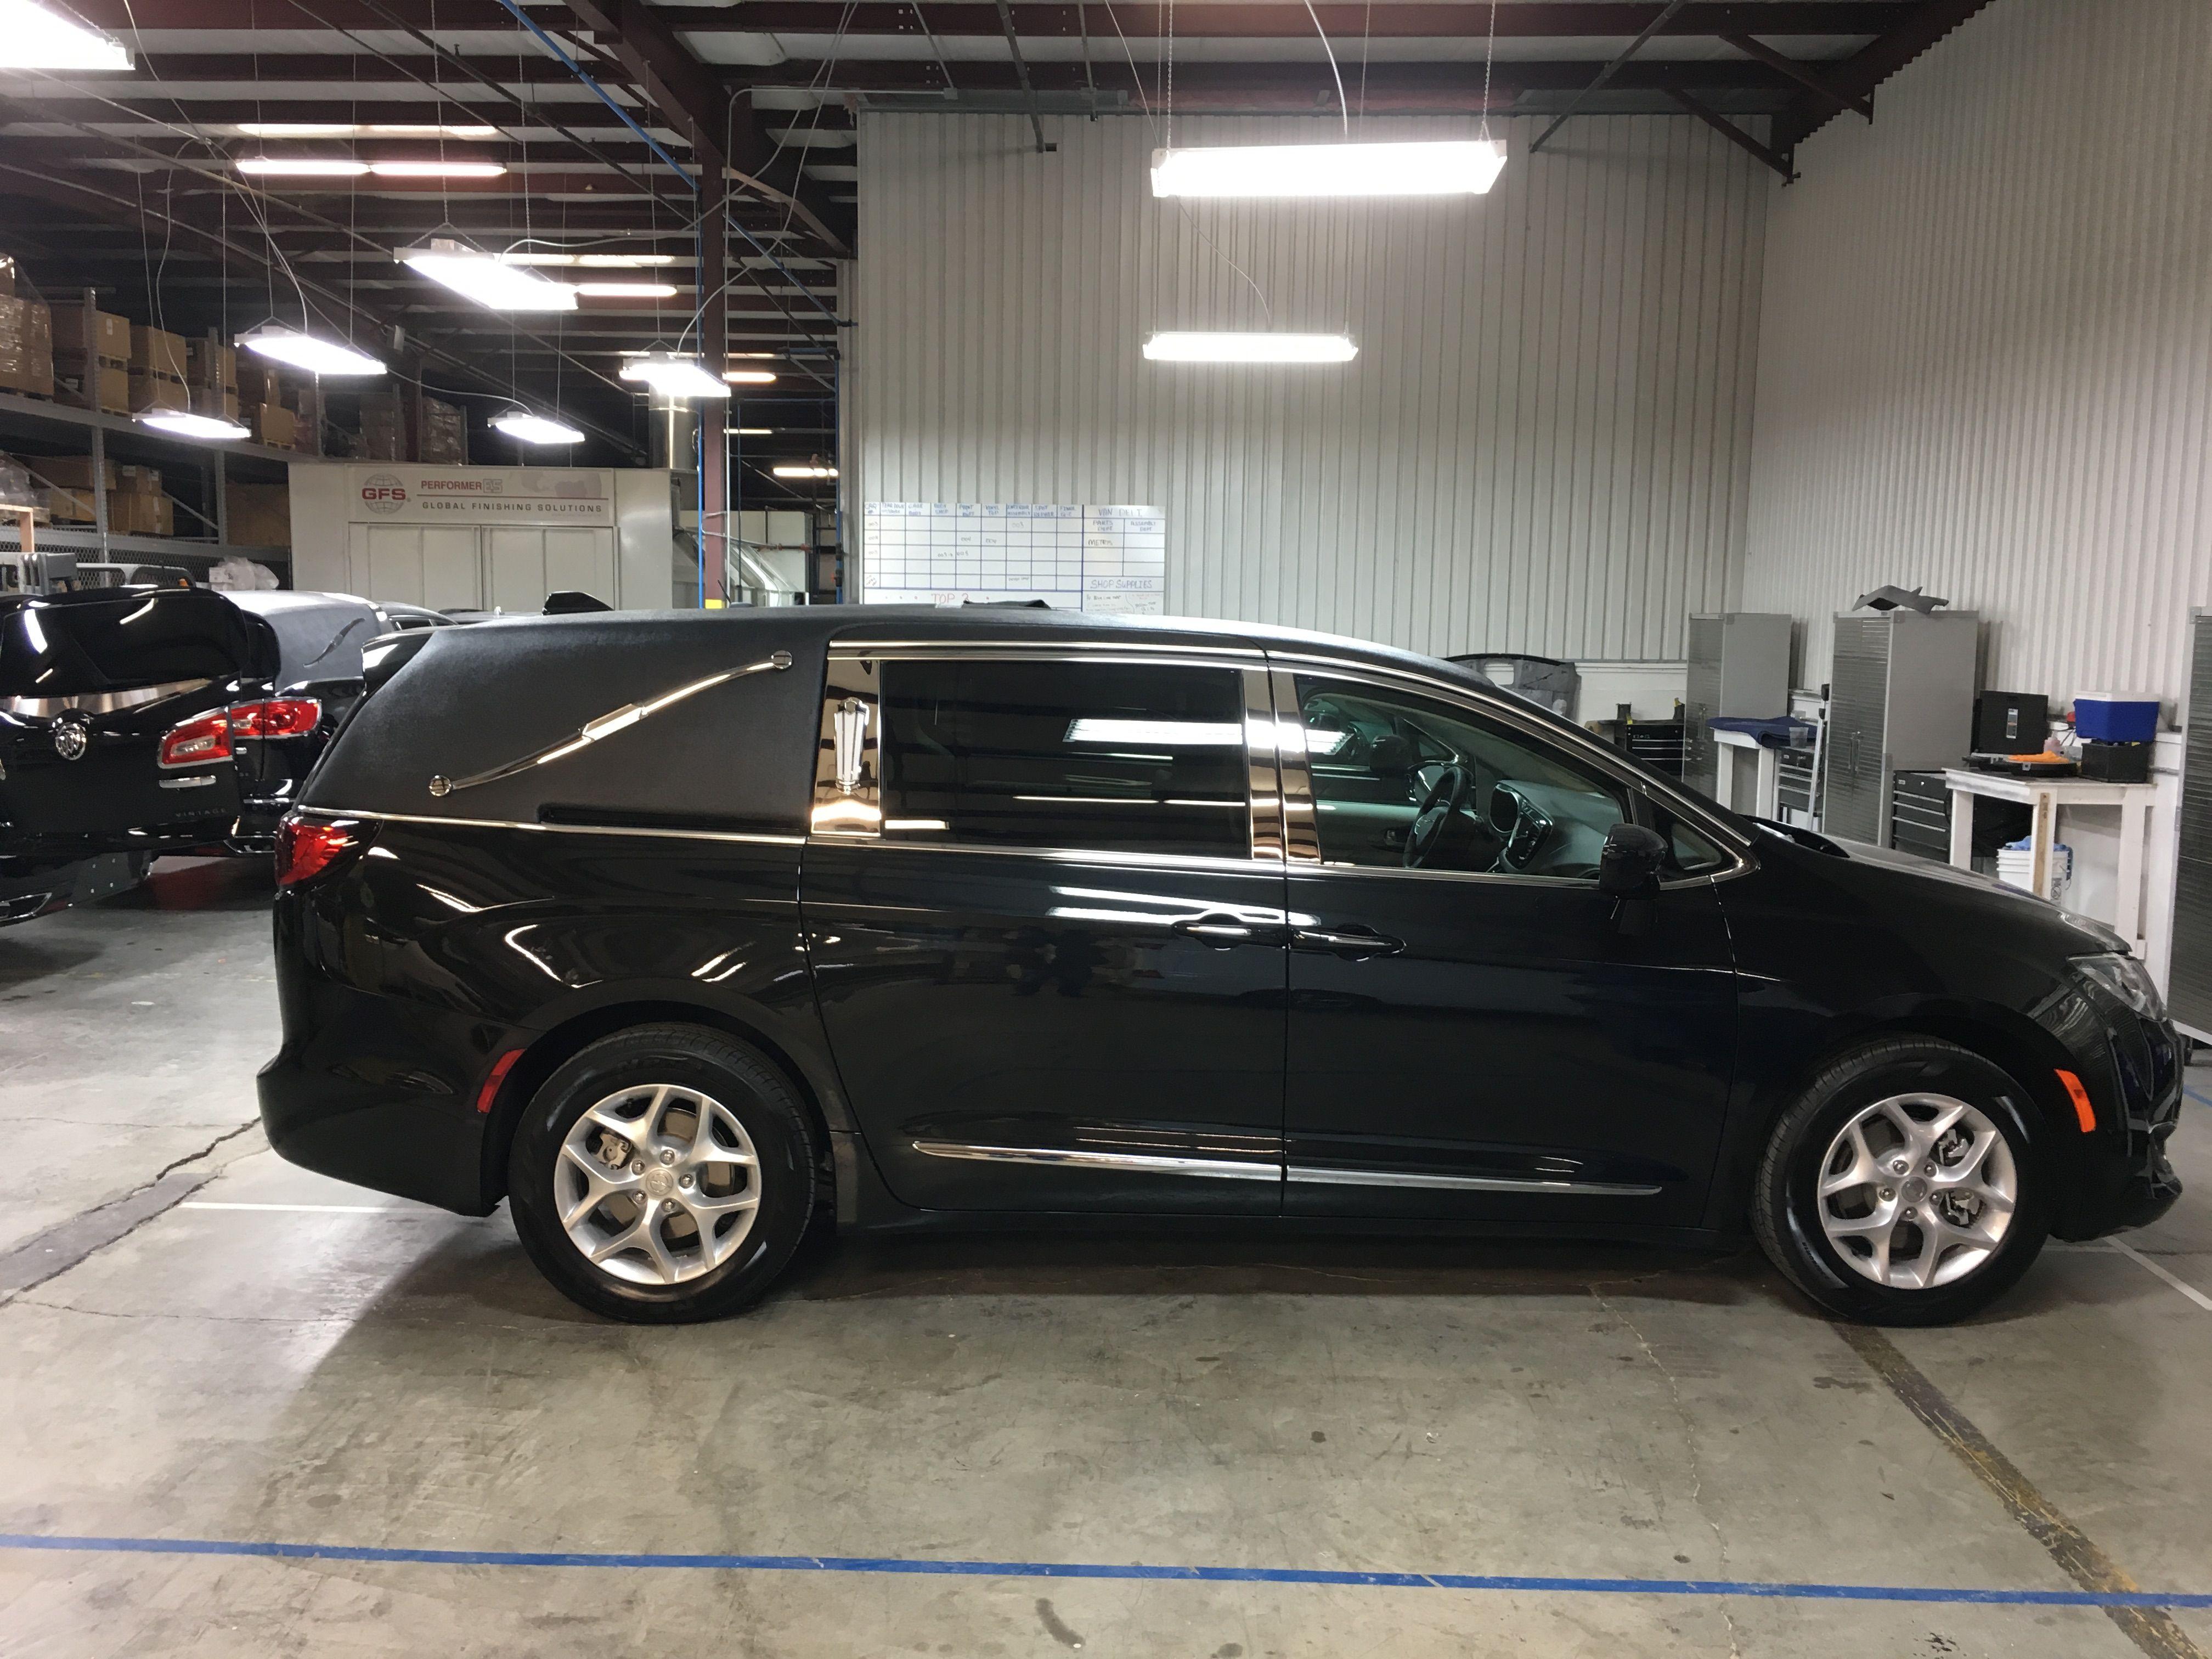 K2 Vehicles Chrysler Pacifica first call van | Business